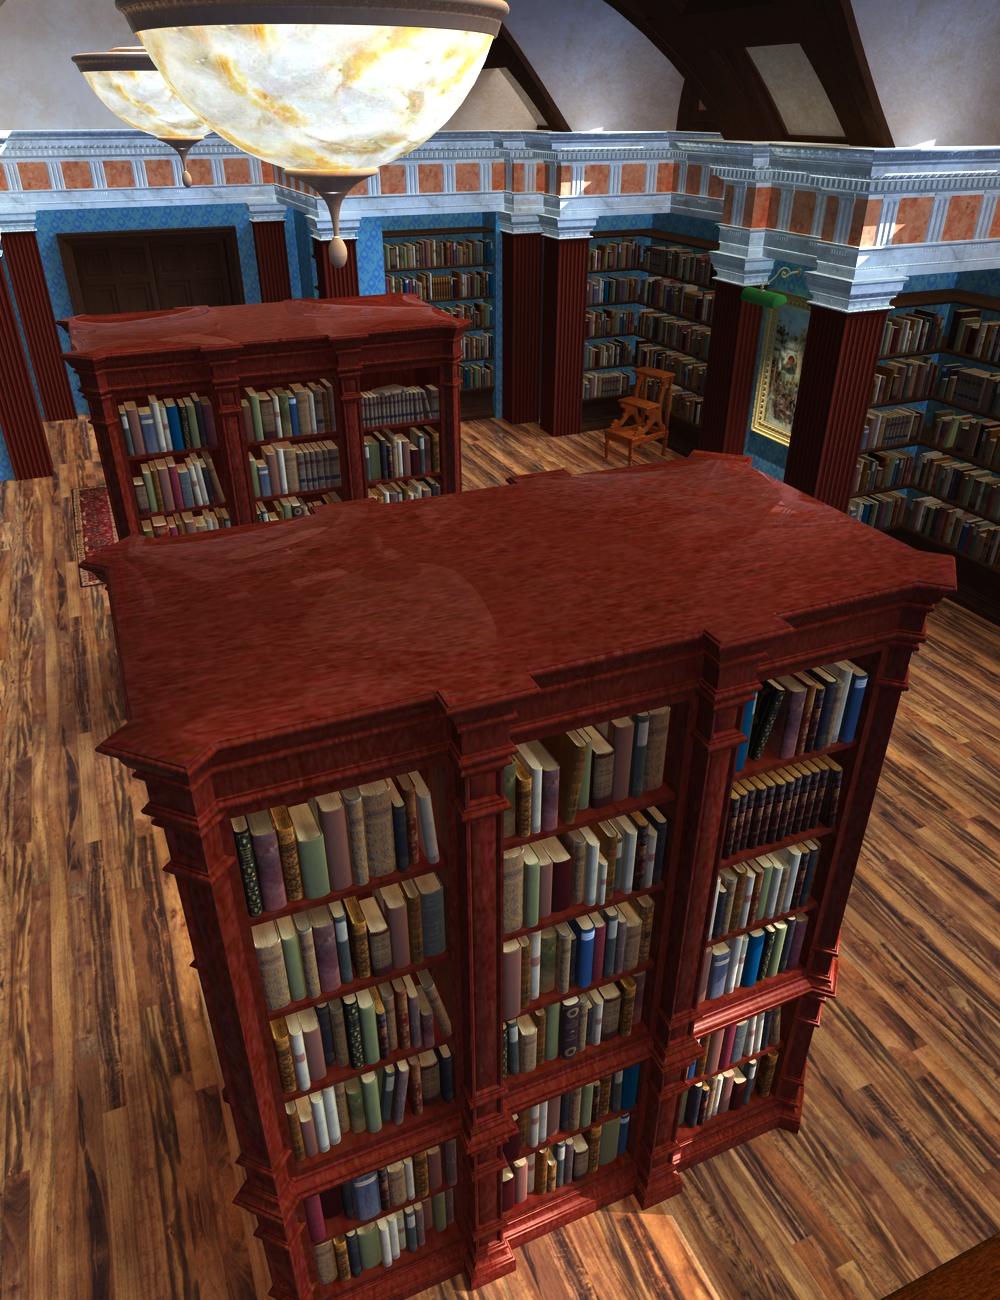 Treasury of Books by: KRAIG, 3D Models by Daz 3D